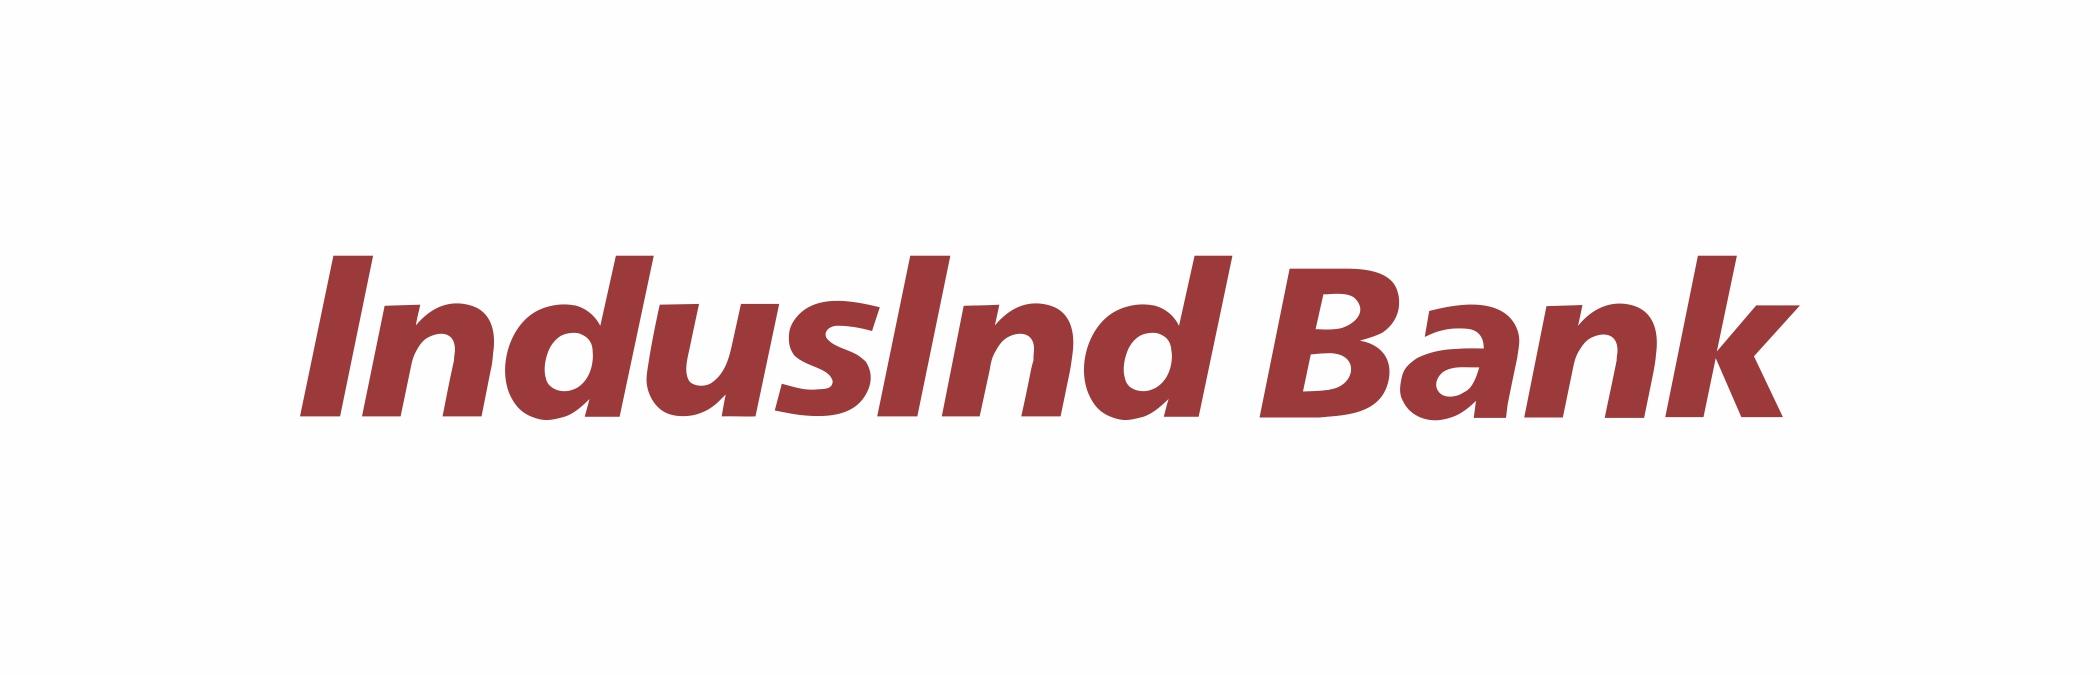 IndusInd Bank,CG ROAD - logo